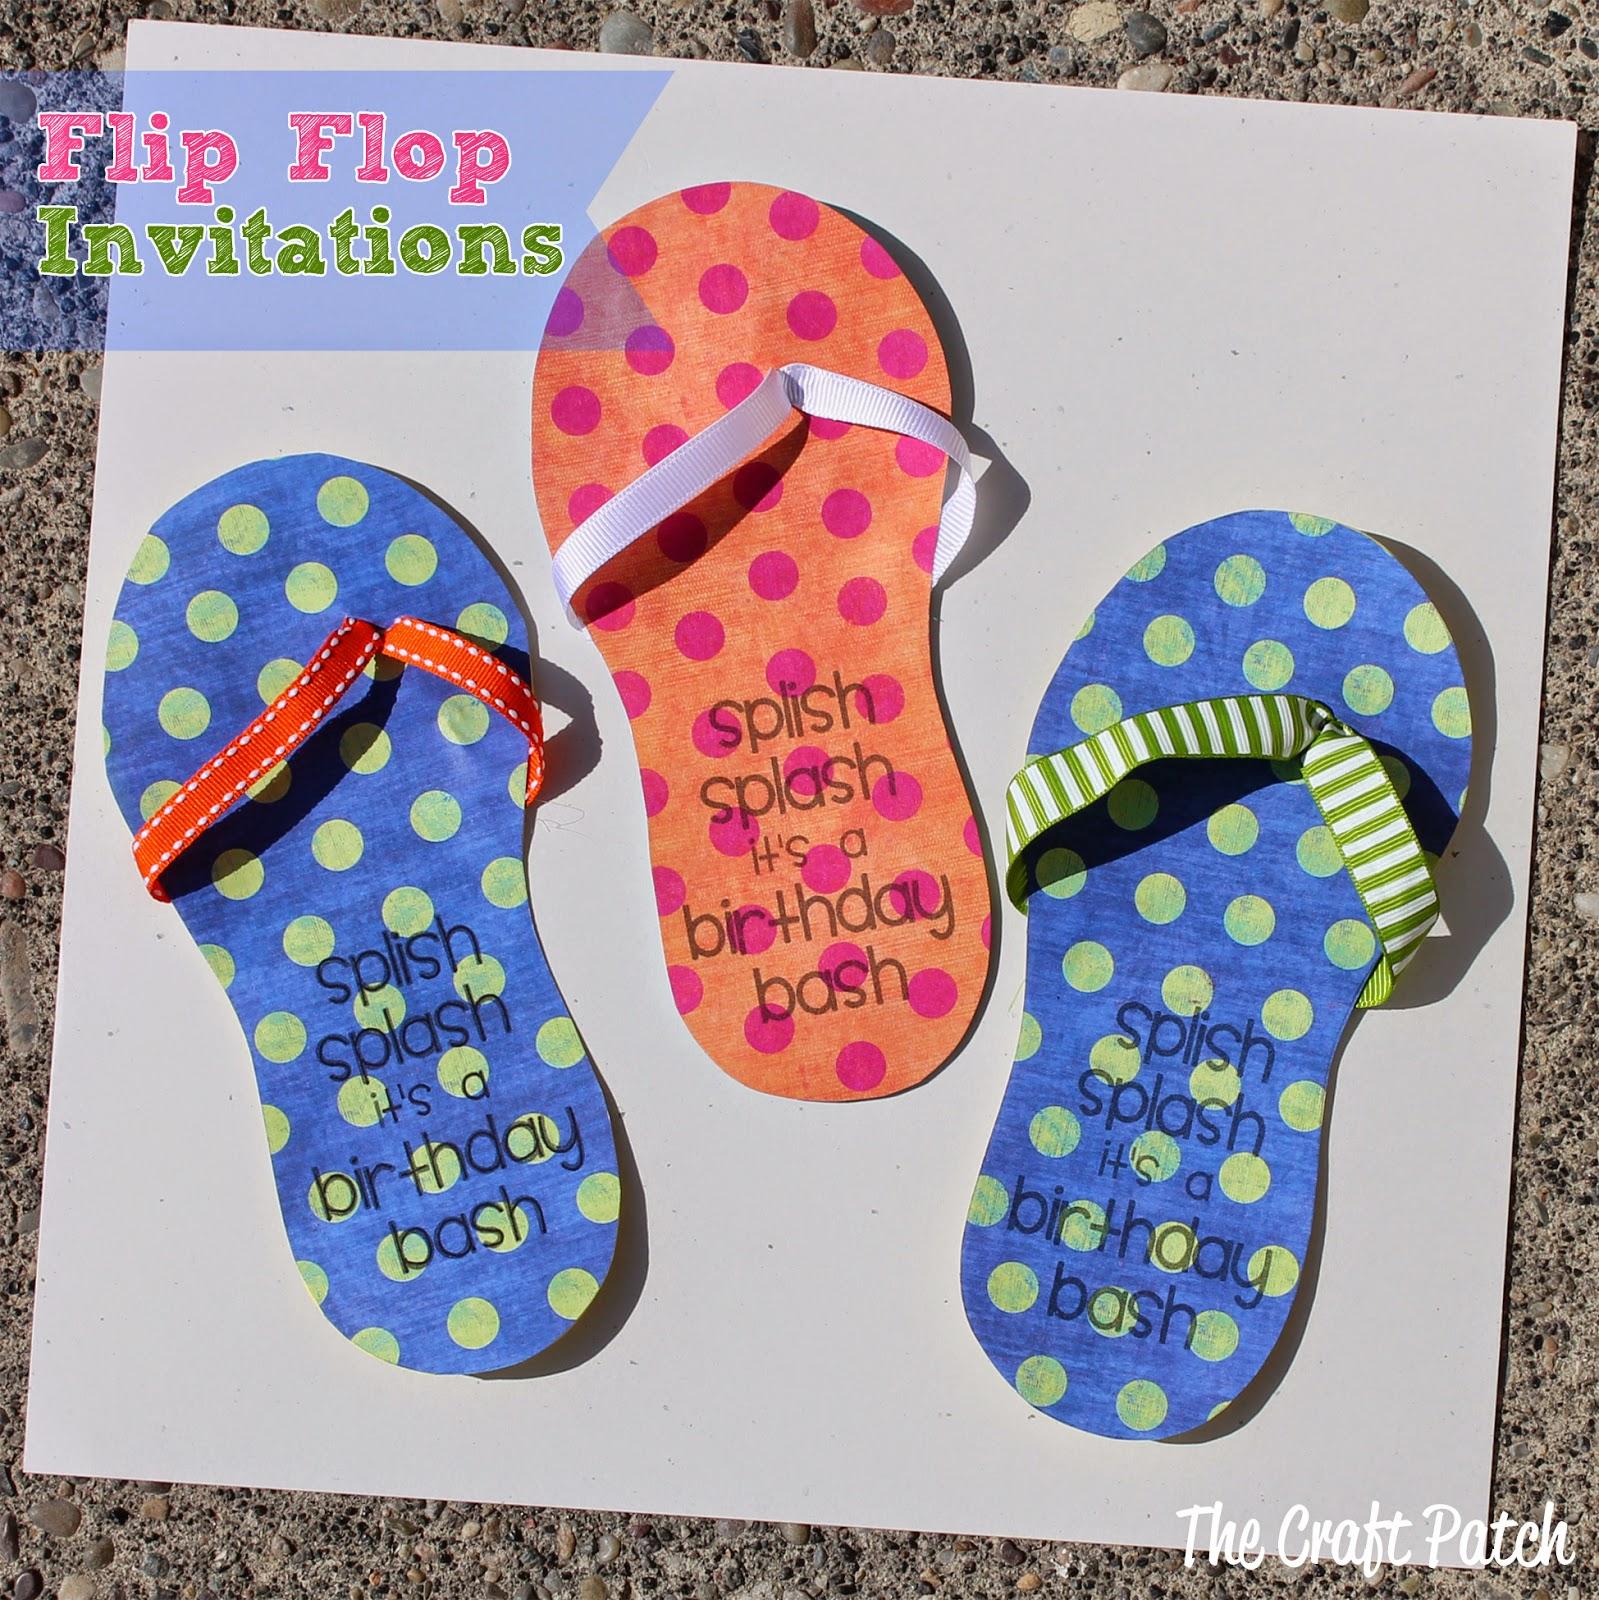 The craft patch flip flop invitations for Flip flops for crafts